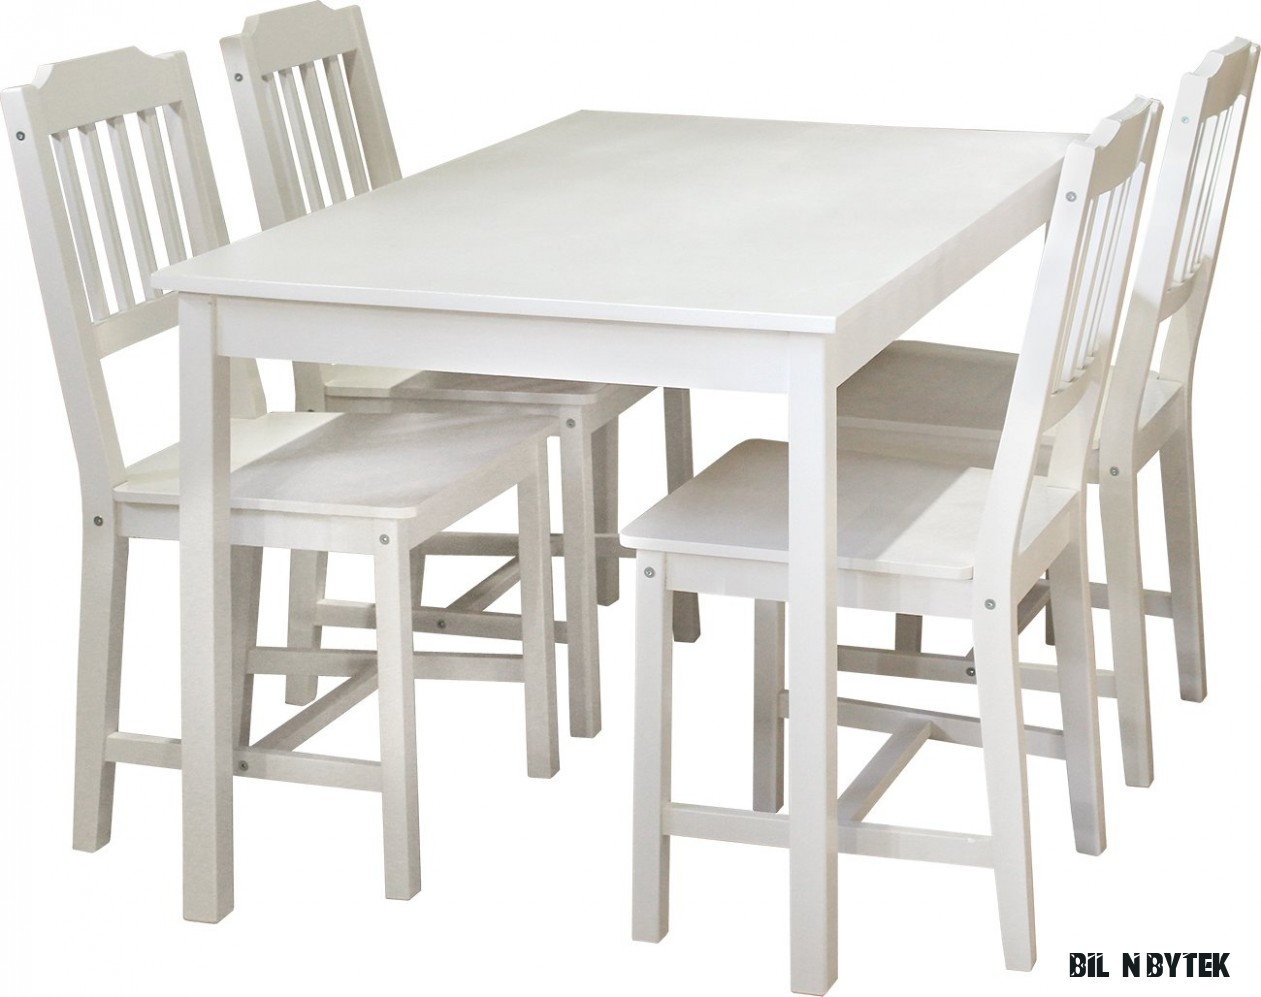 Idea nábytek 16B bílý lak od 16 16 Kč  Zboží.cz